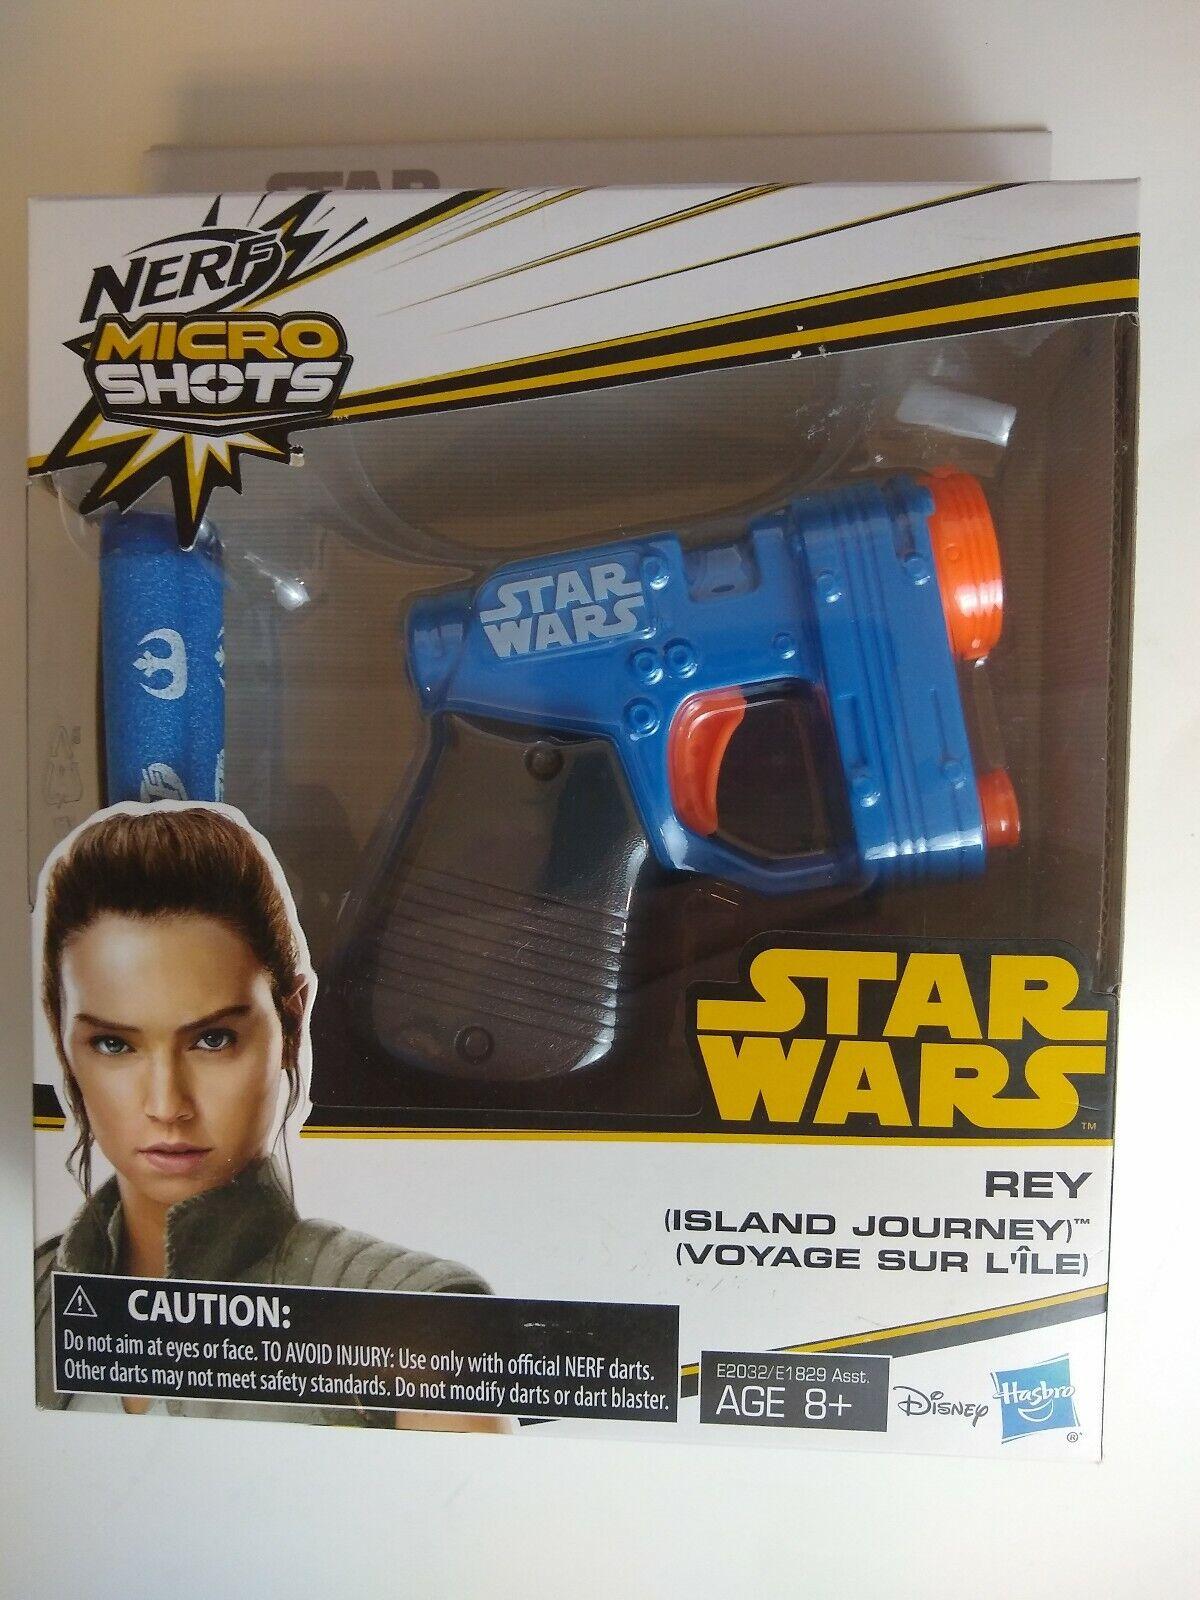 Blaster Hasbro E2032 Island Journey Nerf MicroShots Star Wars Rey